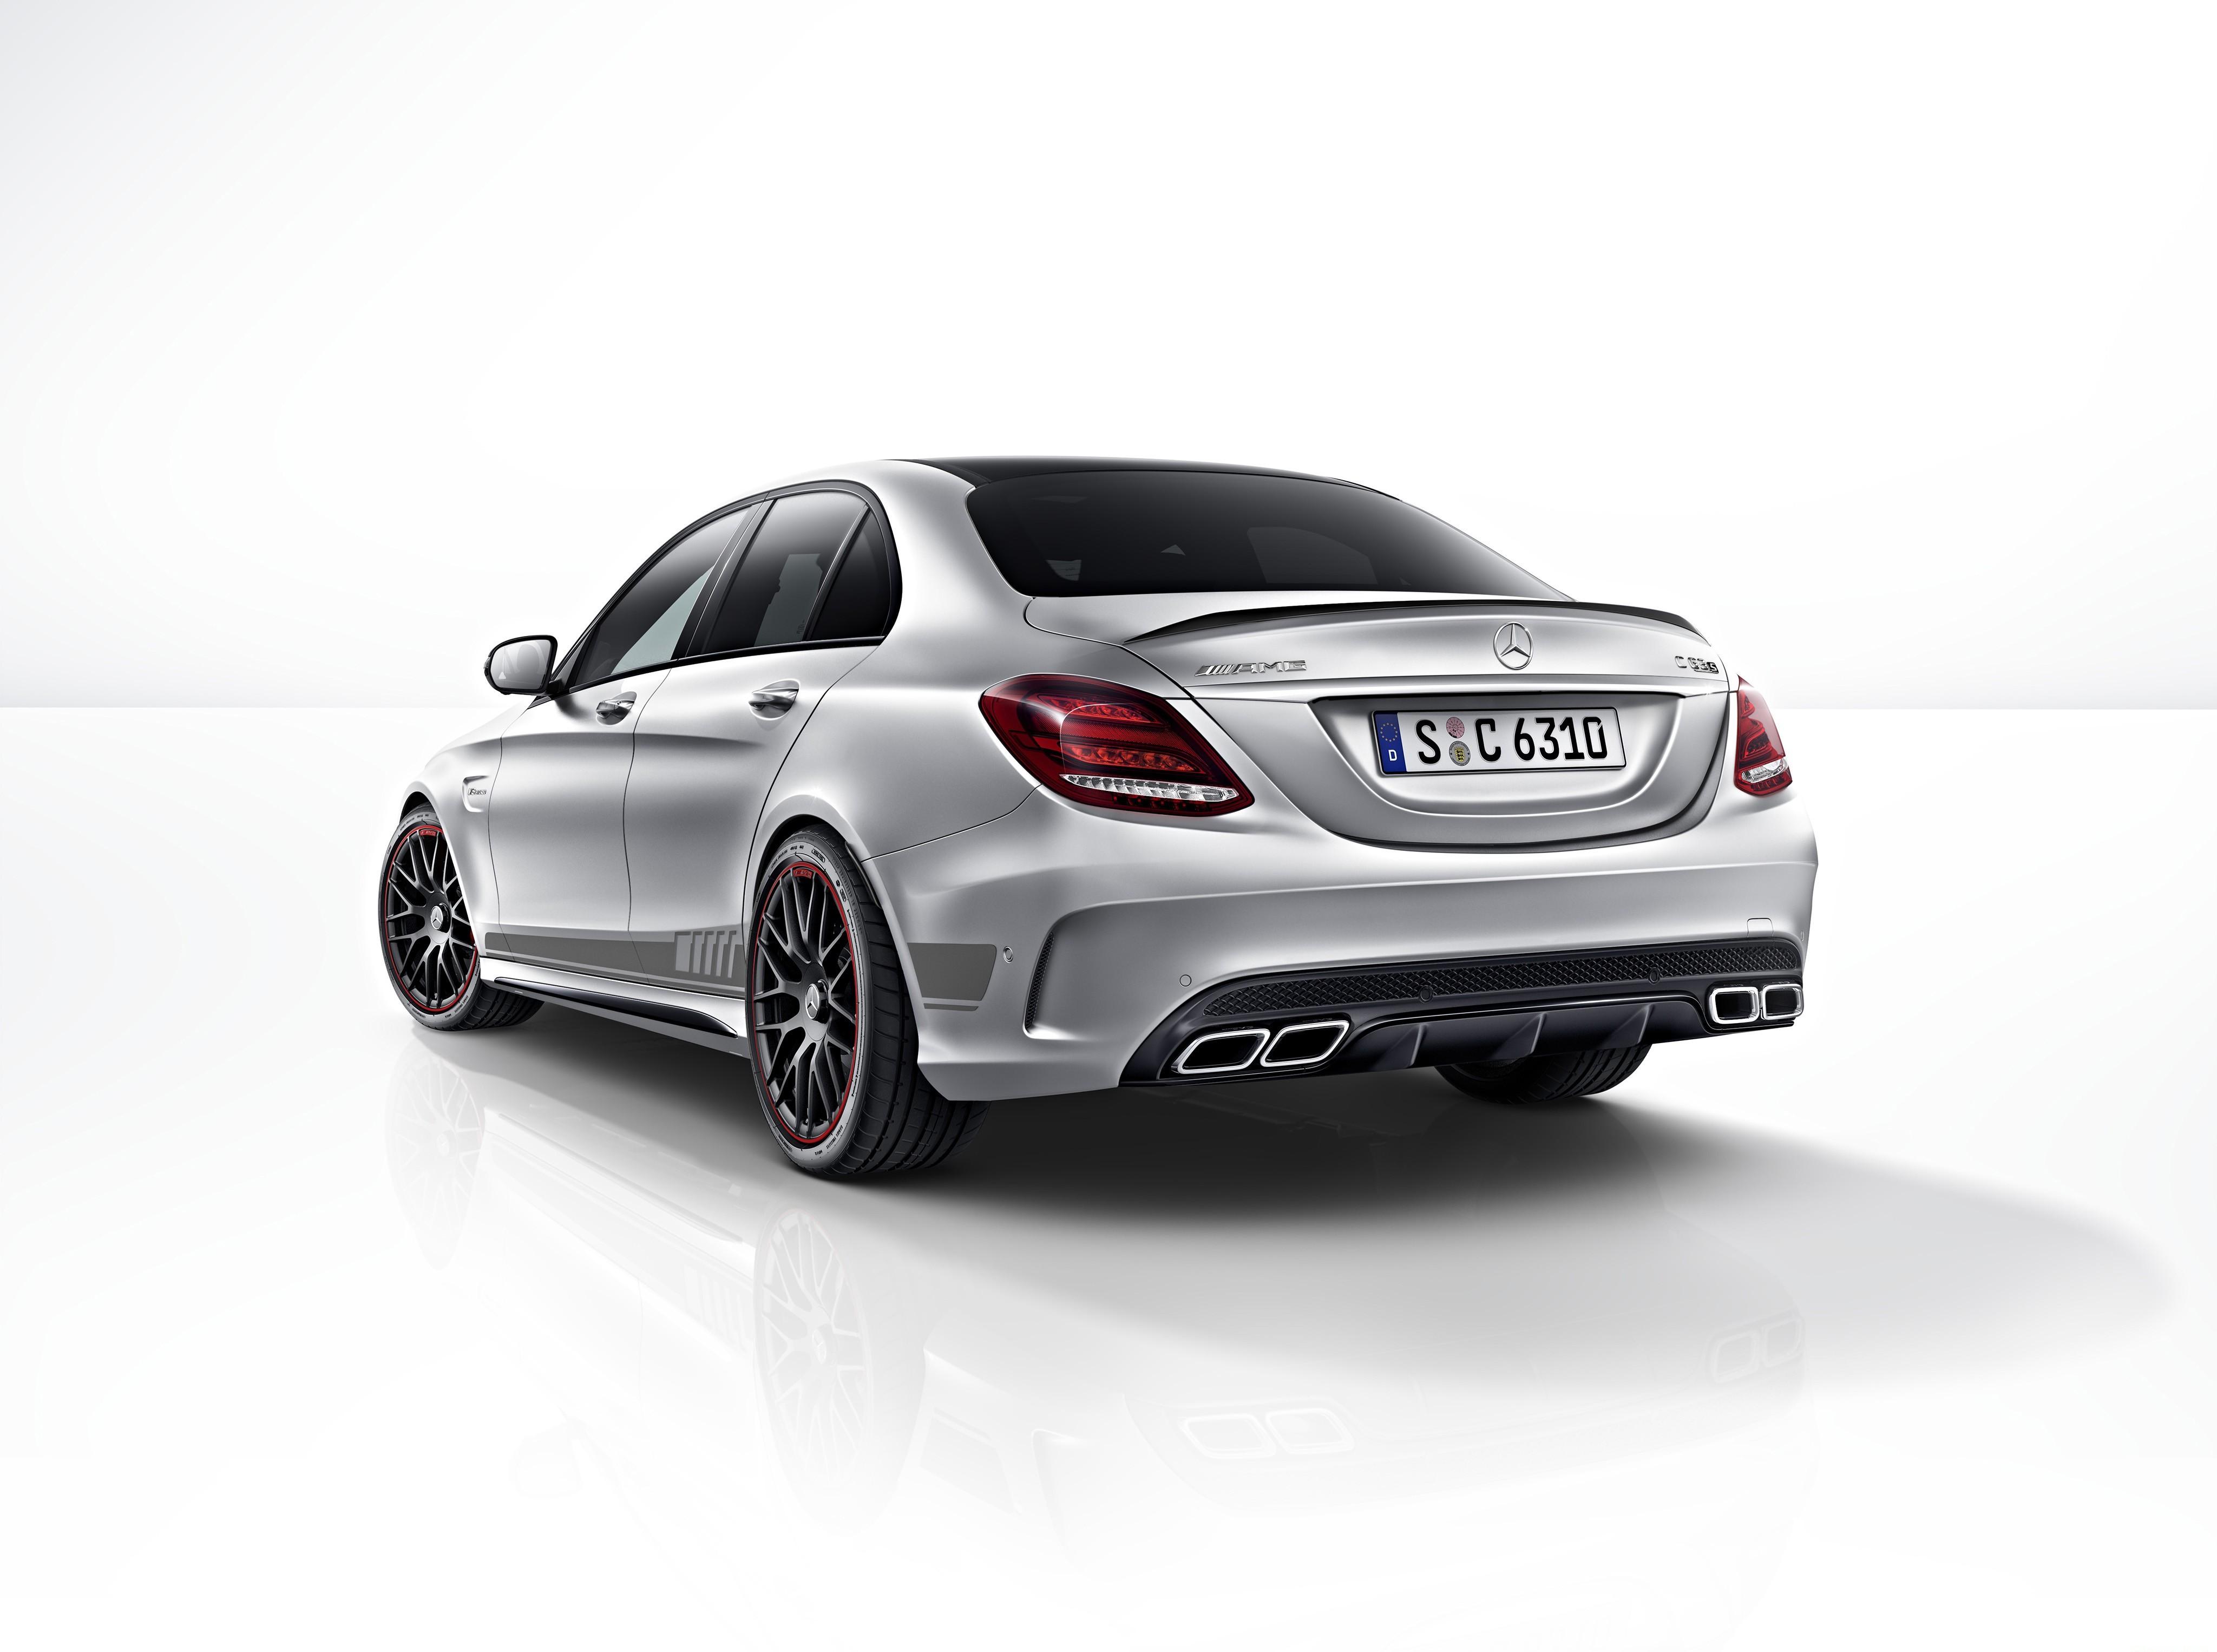 mercedes-Benz c63s 4k Ultra HD Wallpaper | Background ...